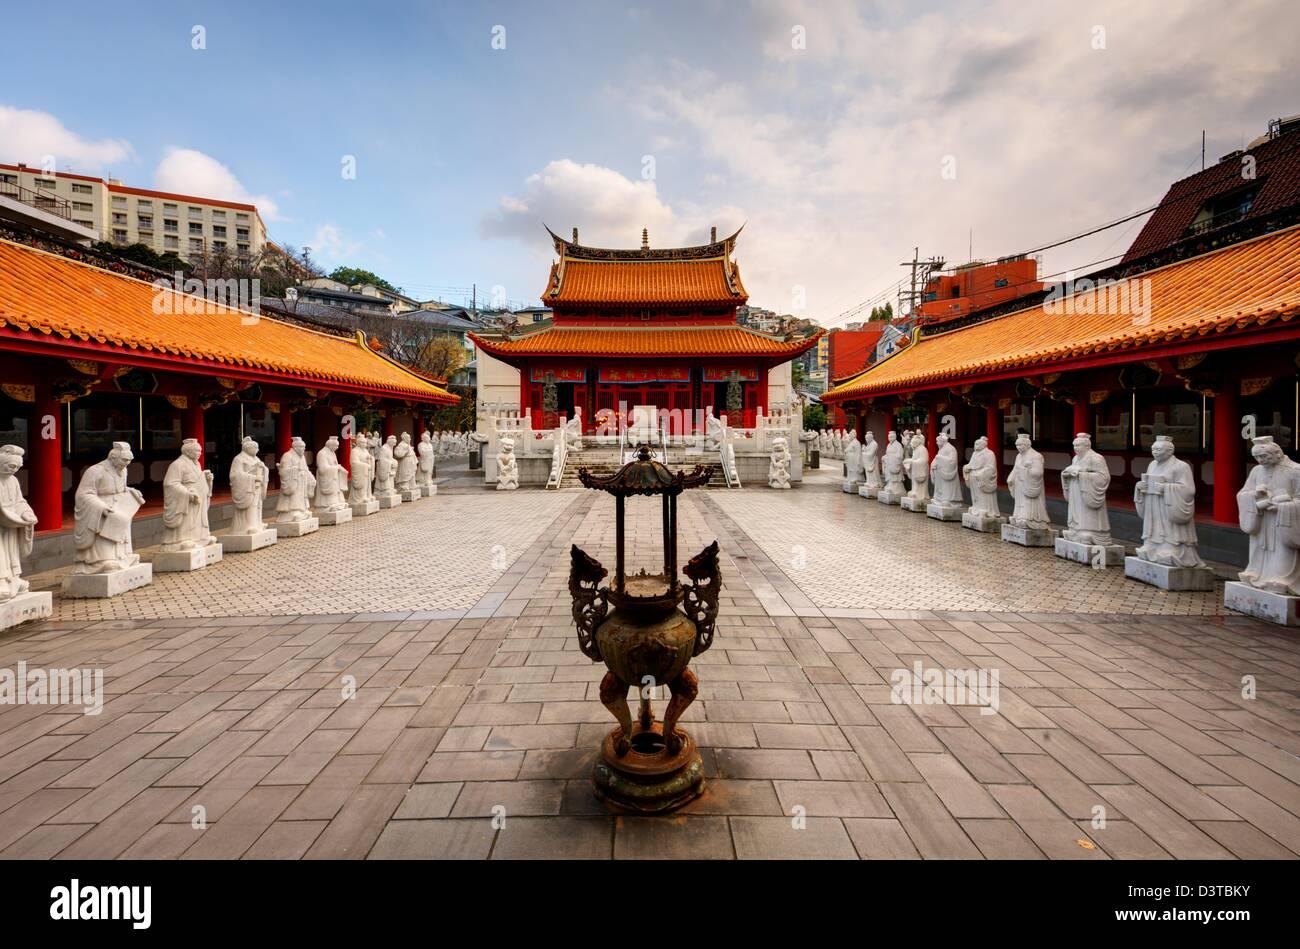 Confucius Shrine in Nagasaki, Japan. - Stock Image